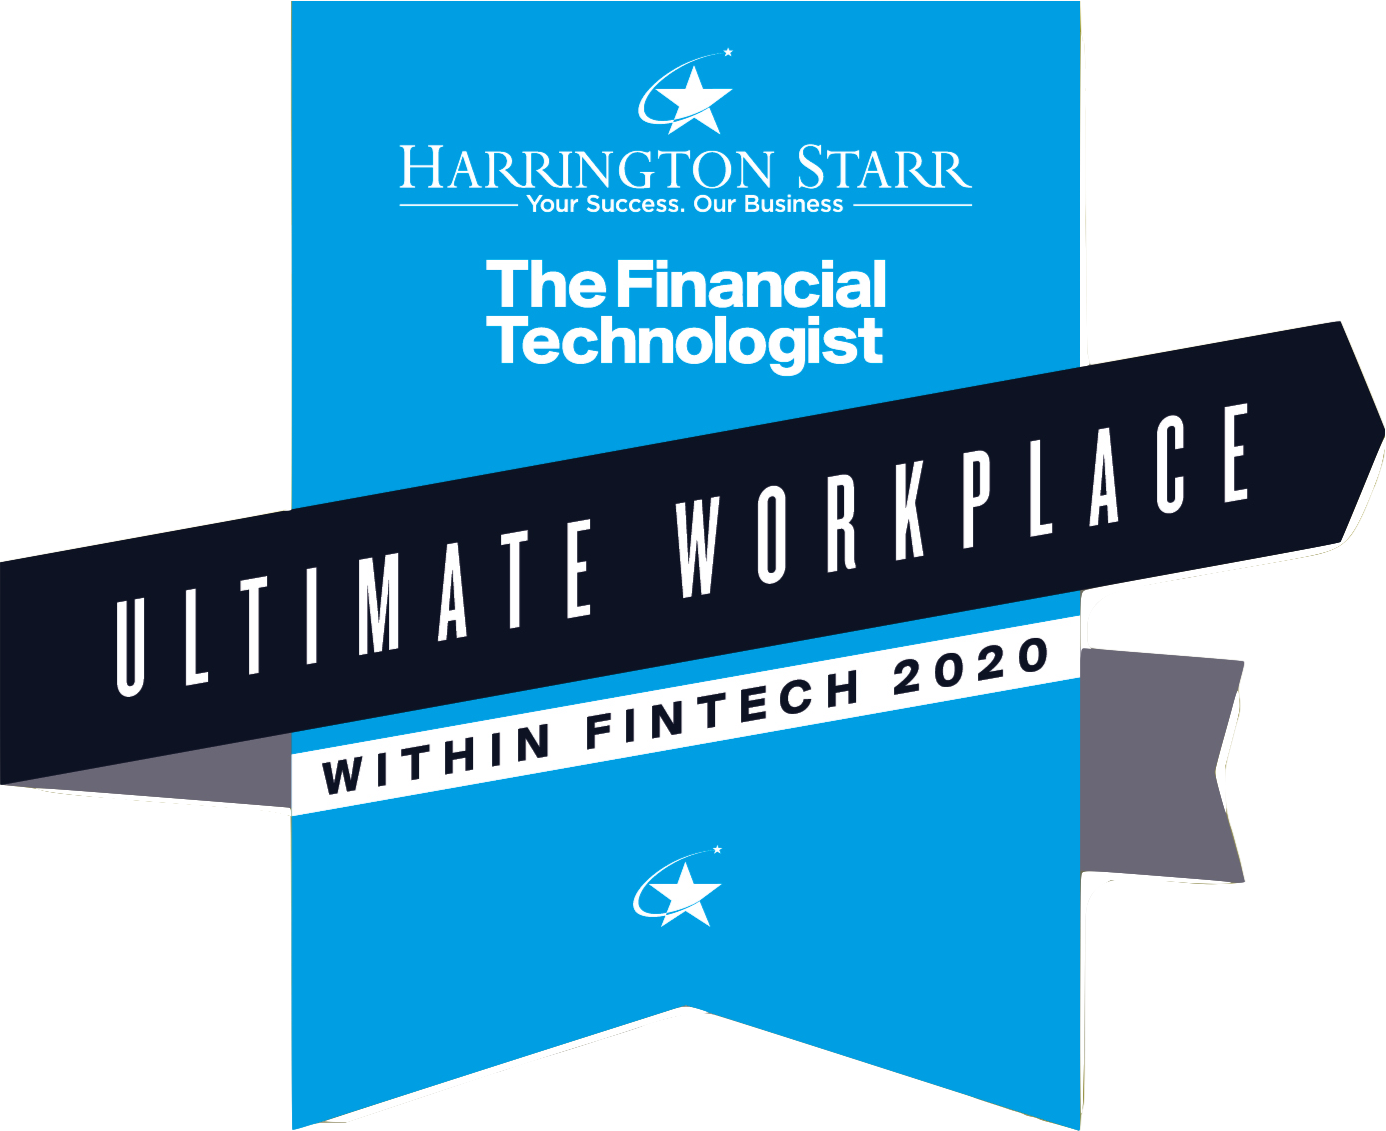 Ultimate FinTech WorkPlace 2020 image 2